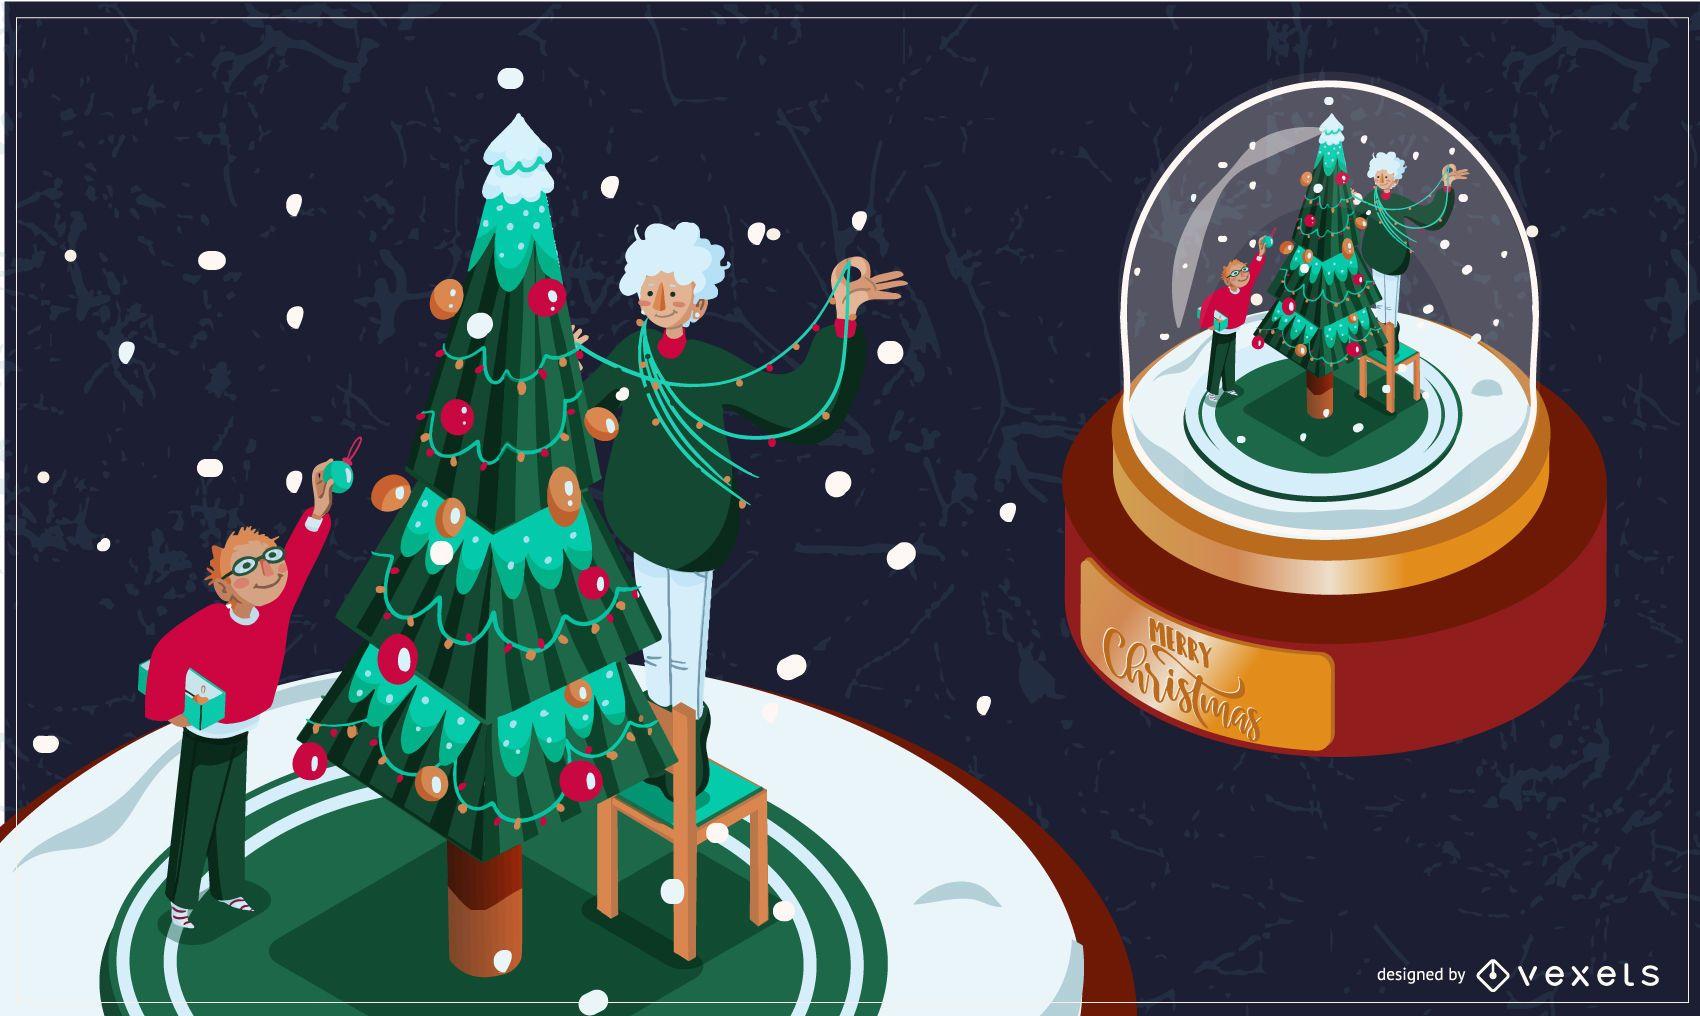 Christmas snowglobe illustration